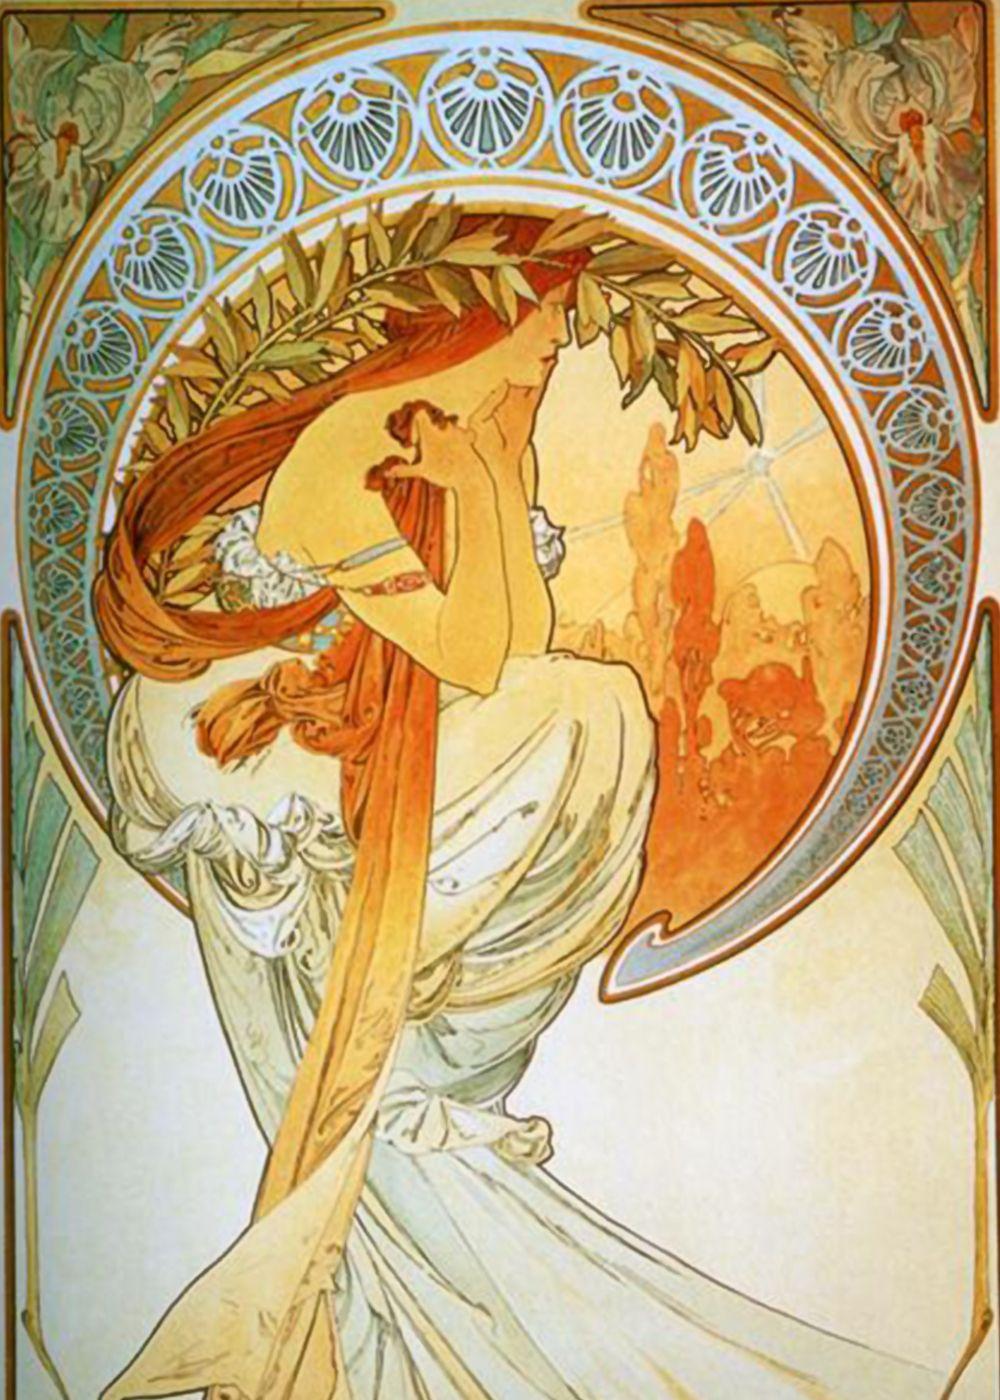 *~*~*~*~*~*~*~*~*~*~*~*~*~Alphonse Mucha. Poetry 1898 - The Arts Series  *~*~*~*~*~*~*~